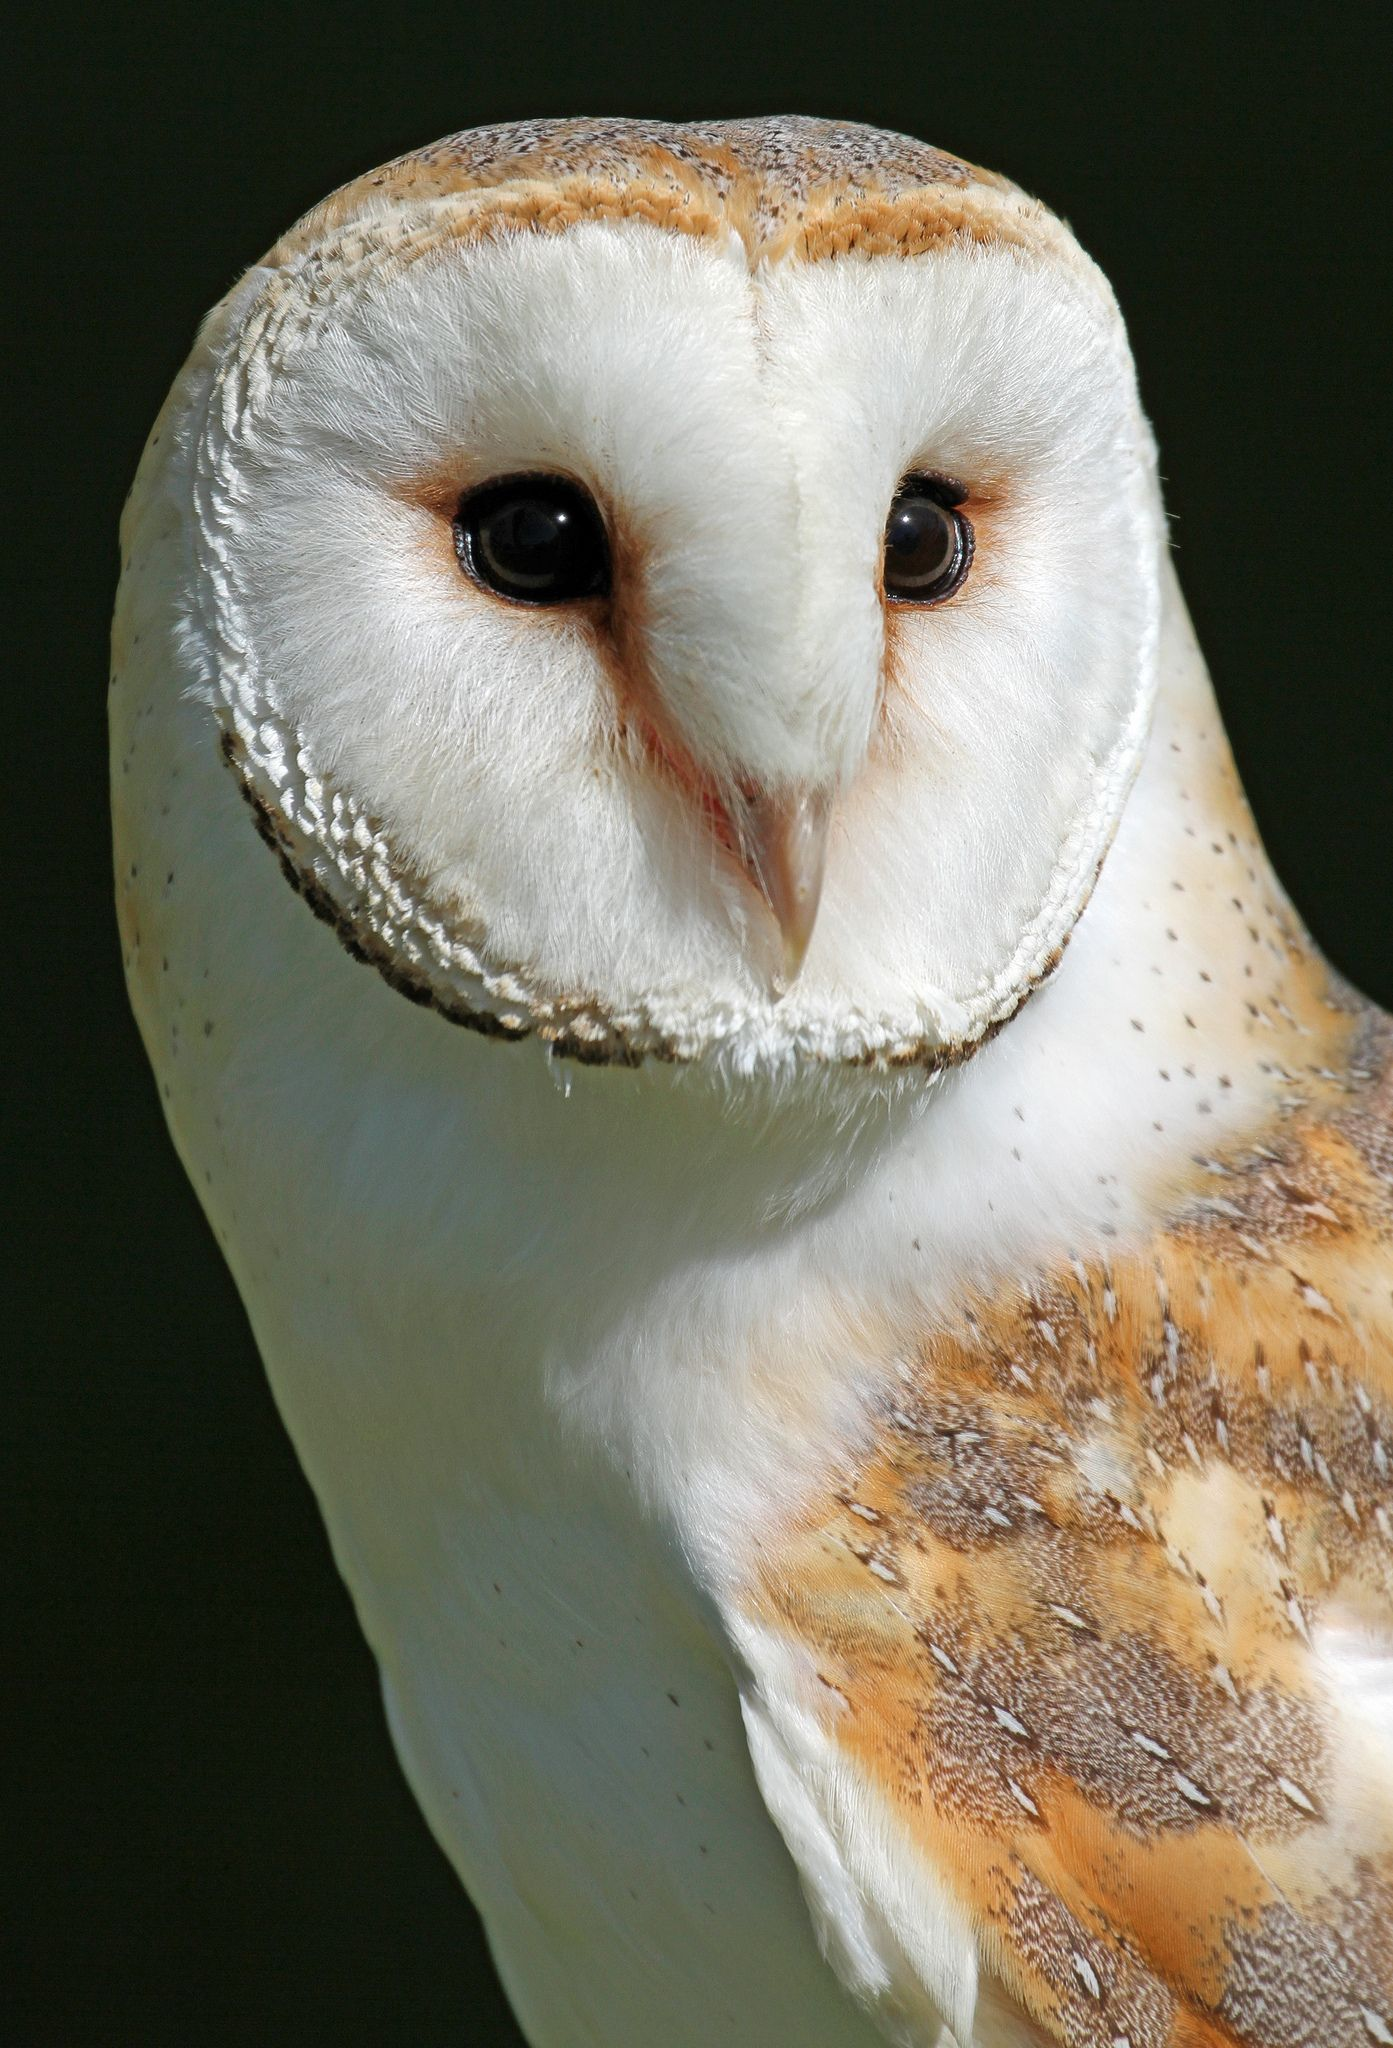 Barn Owl Effraie des clochers, Chouette effraie, Animaux